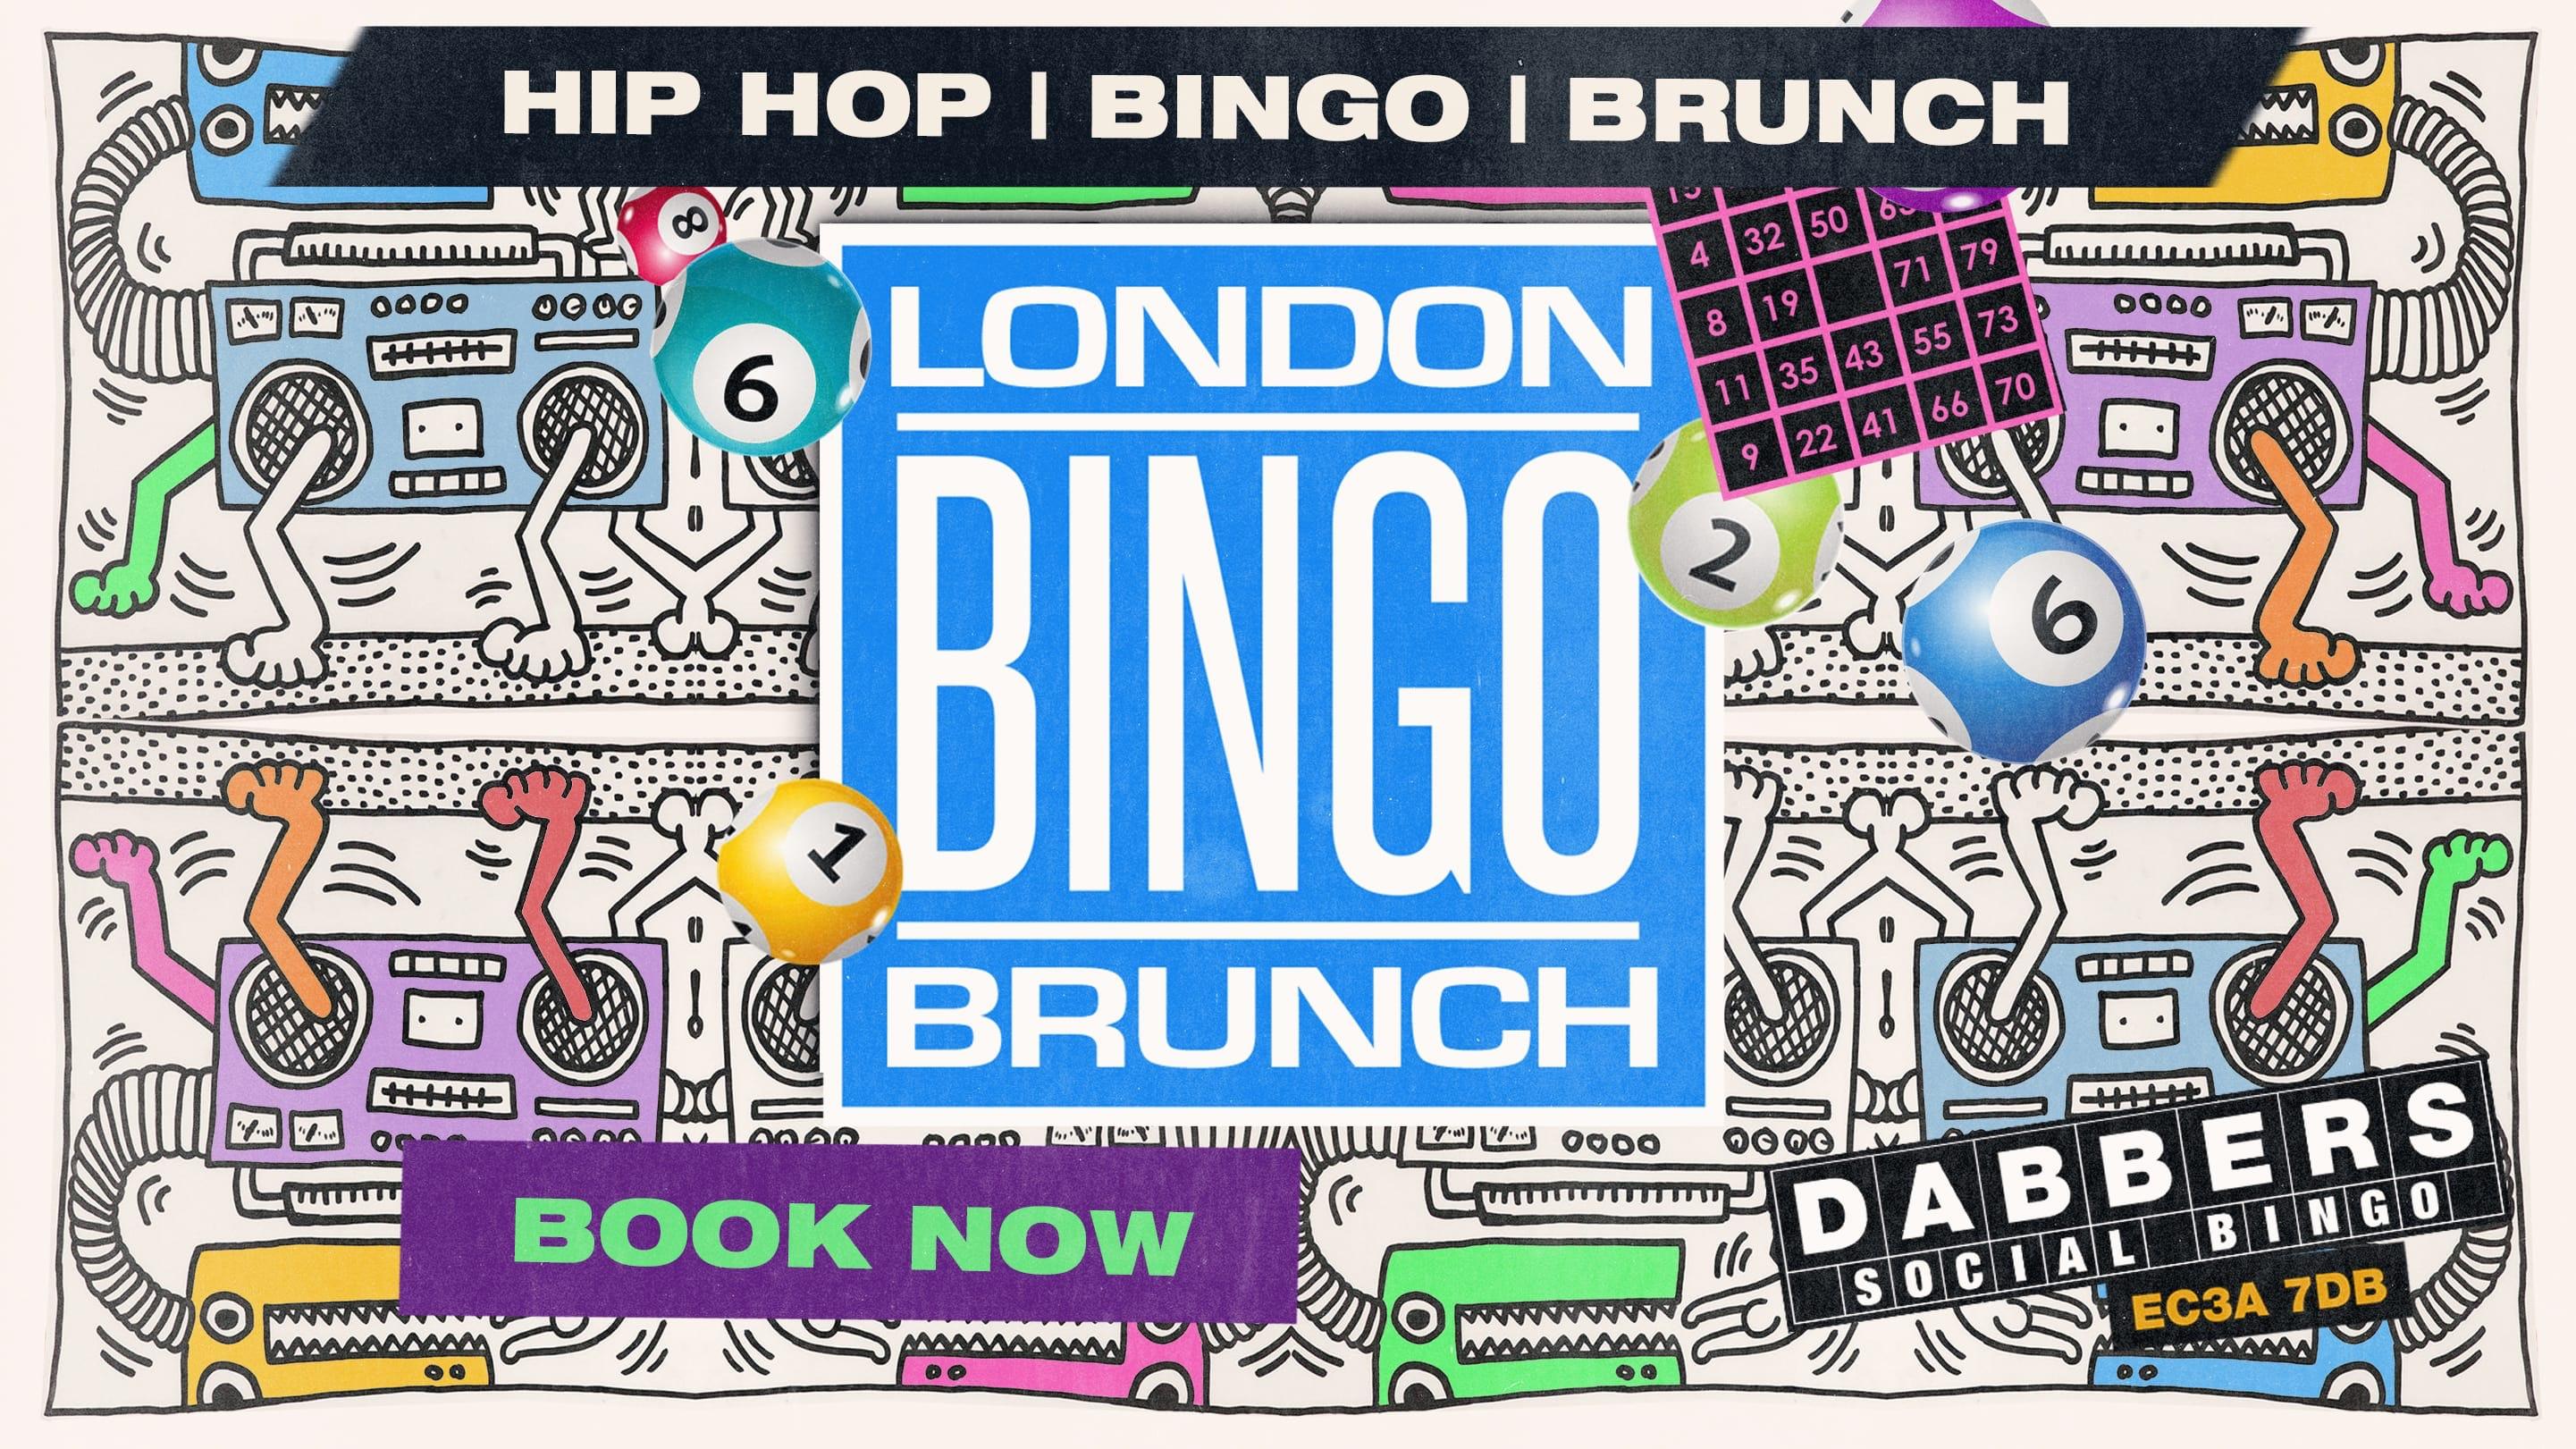 London Bingo Brunch: The All Day Hip Hop Bingo & Brunch Party!